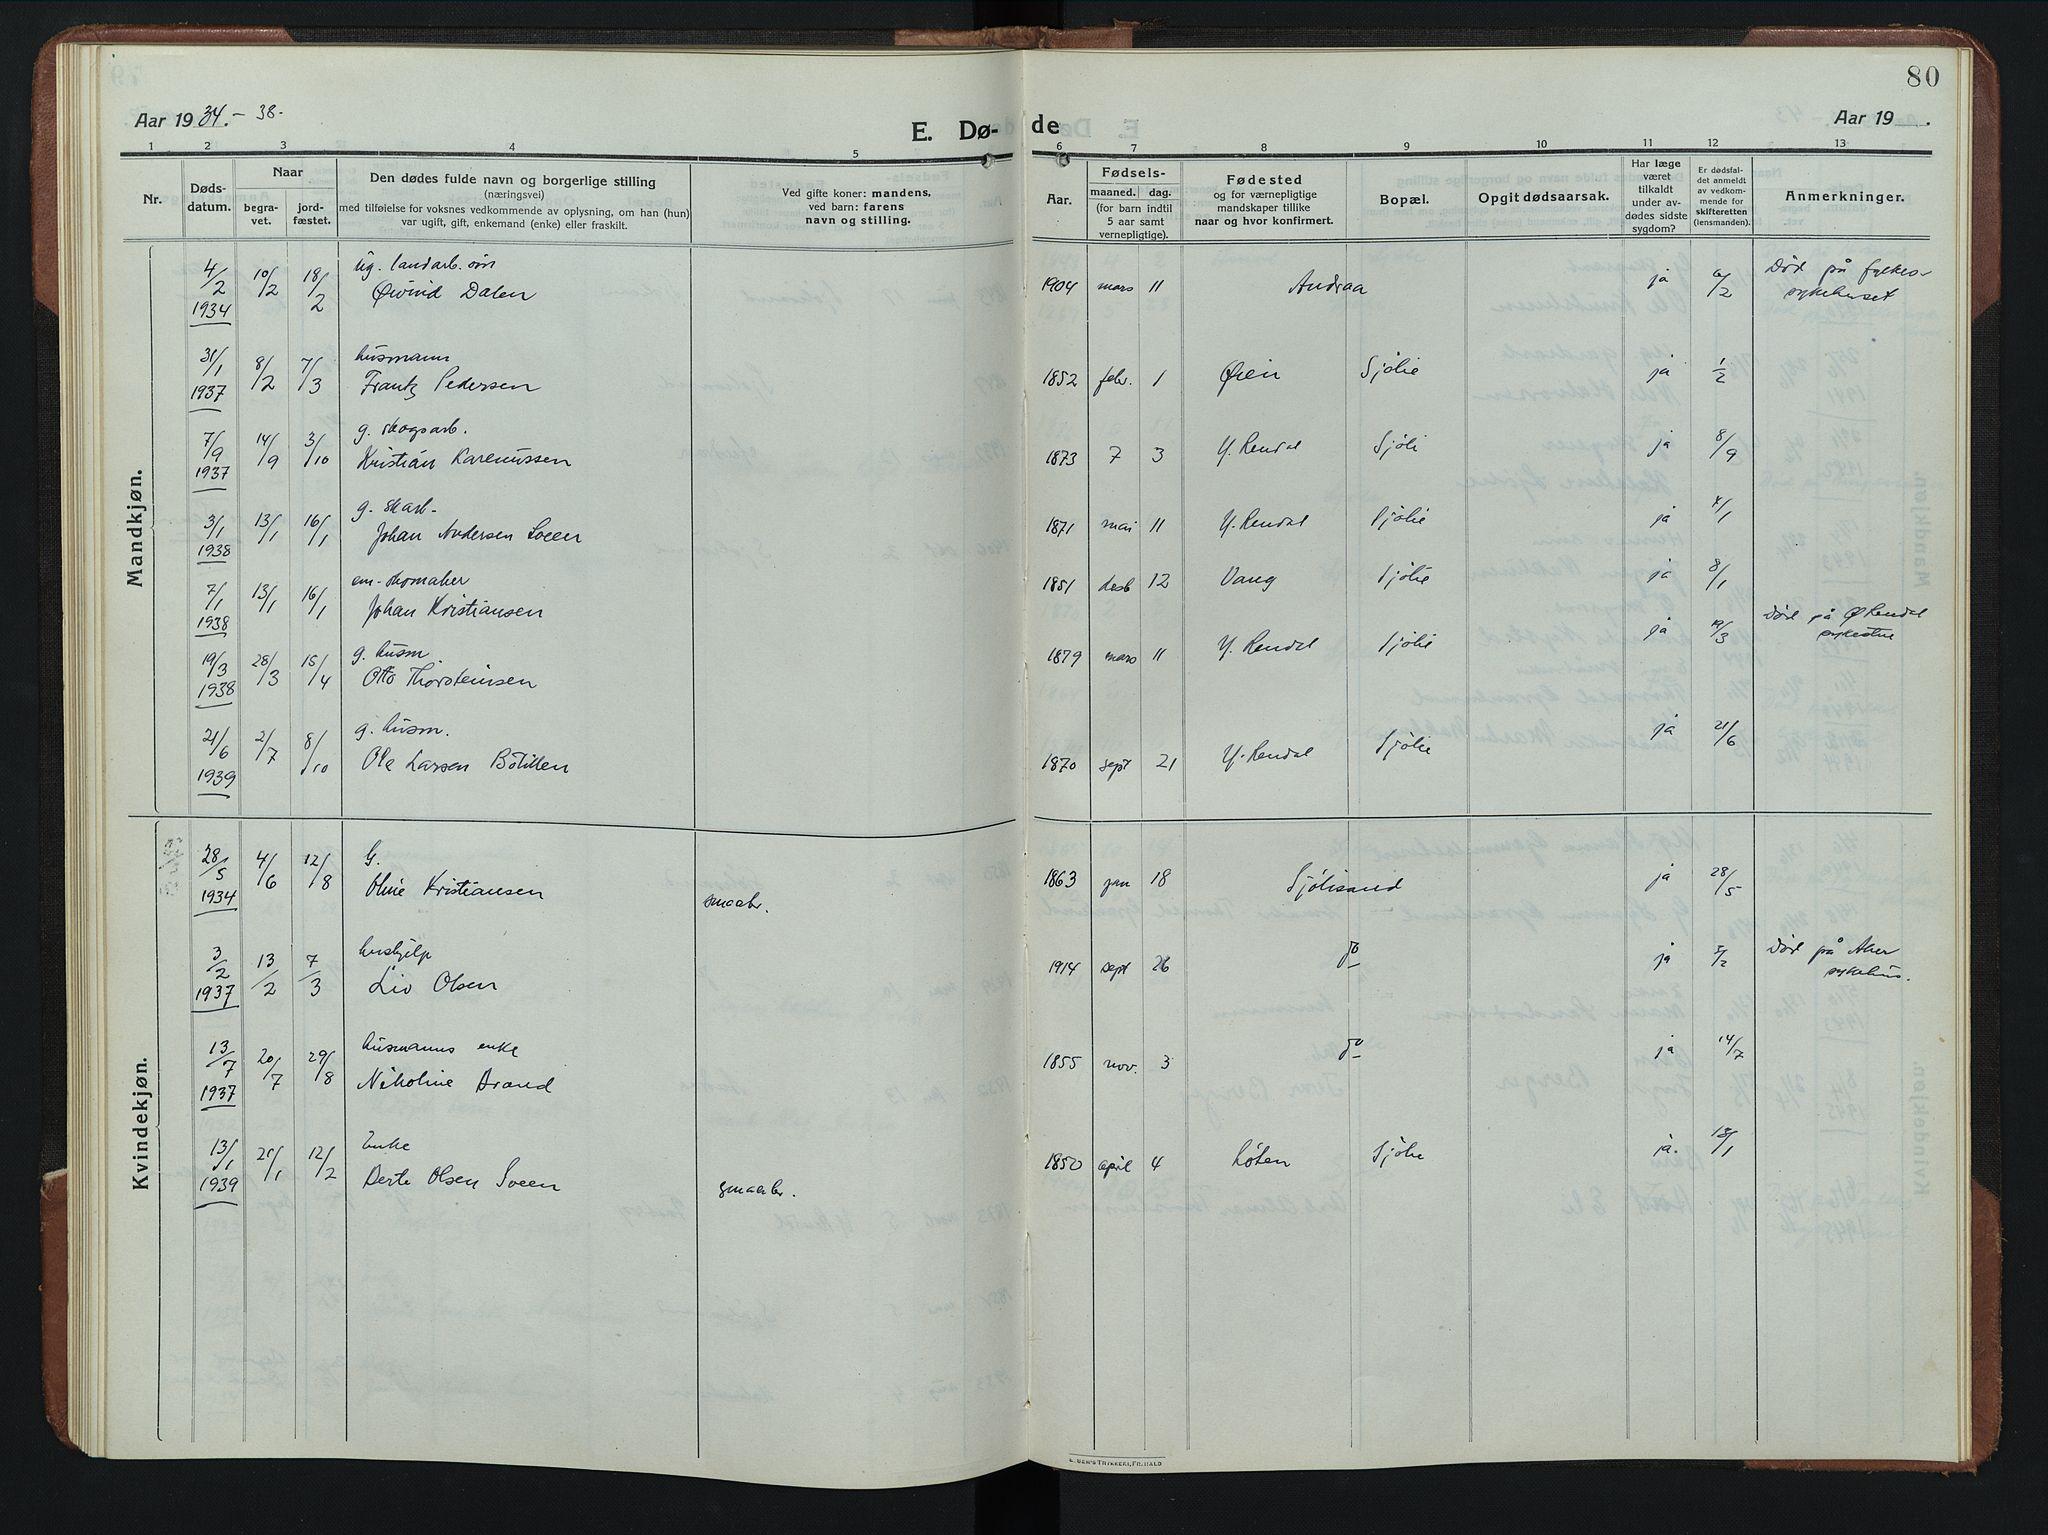 SAH, Rendalen prestekontor, H/Ha/Hab/L0008: Parish register (copy) no. 8, 1914-1948, p. 80